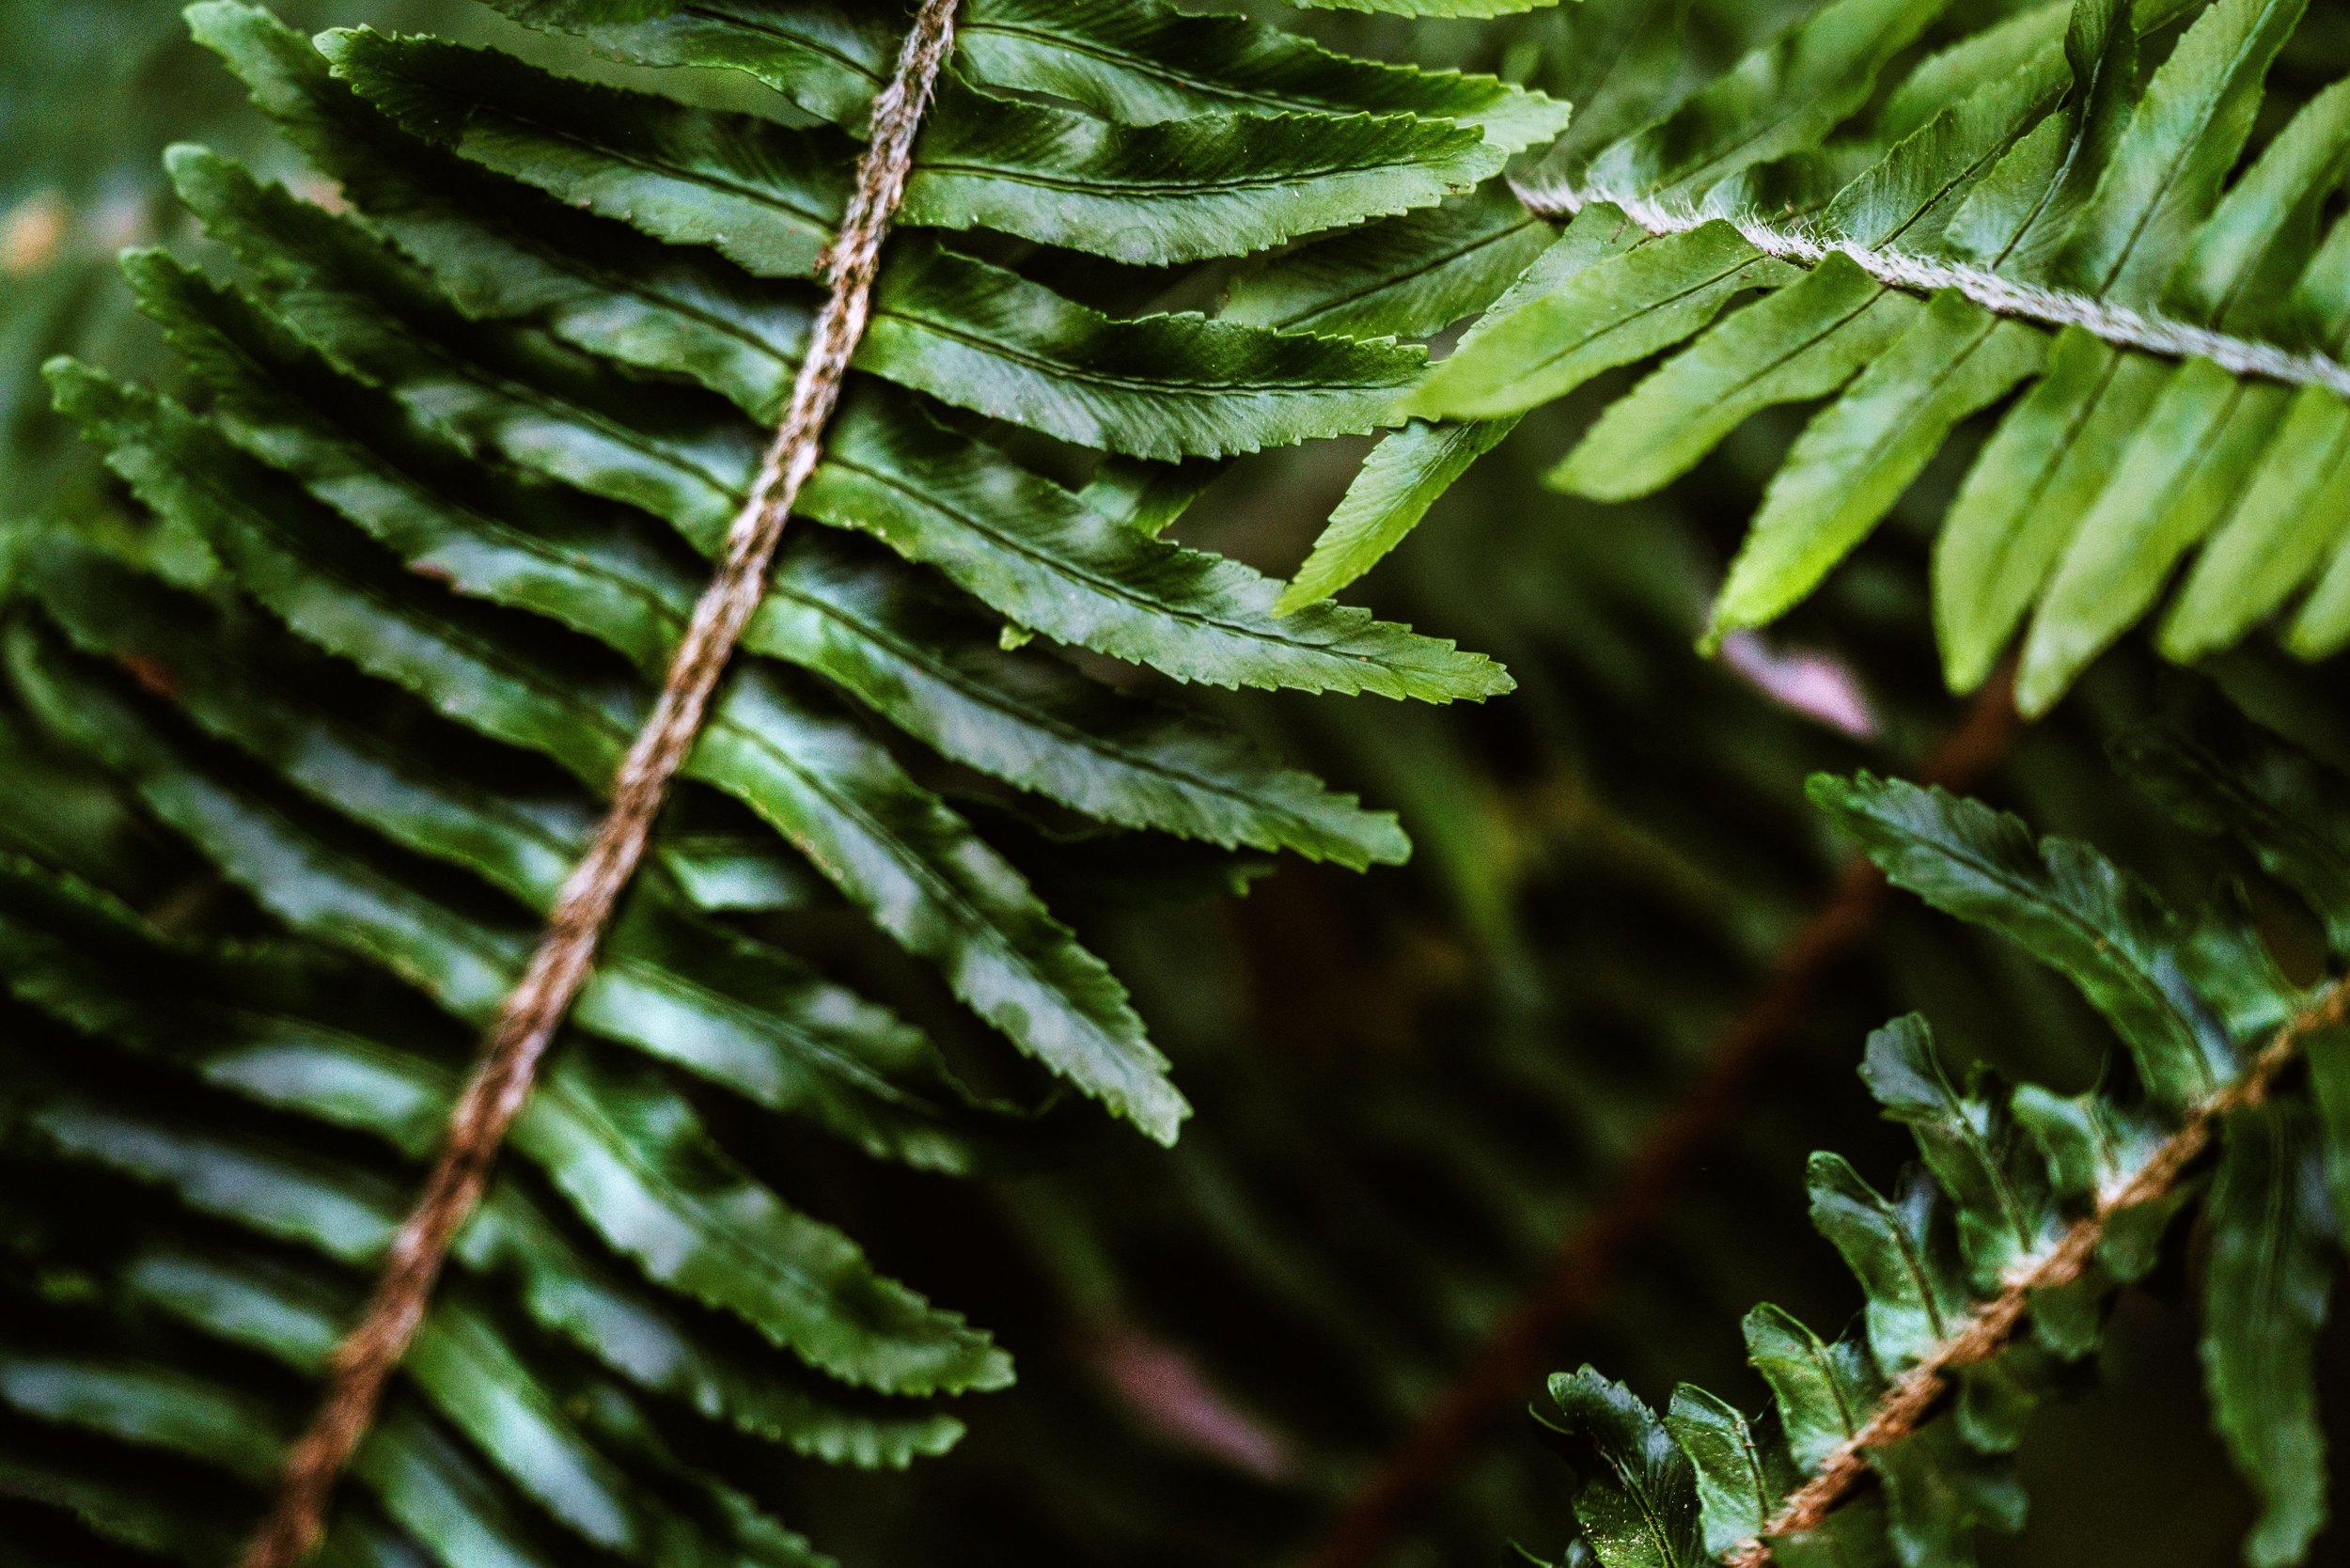 dark-green-foliage_4460x4460.jpg